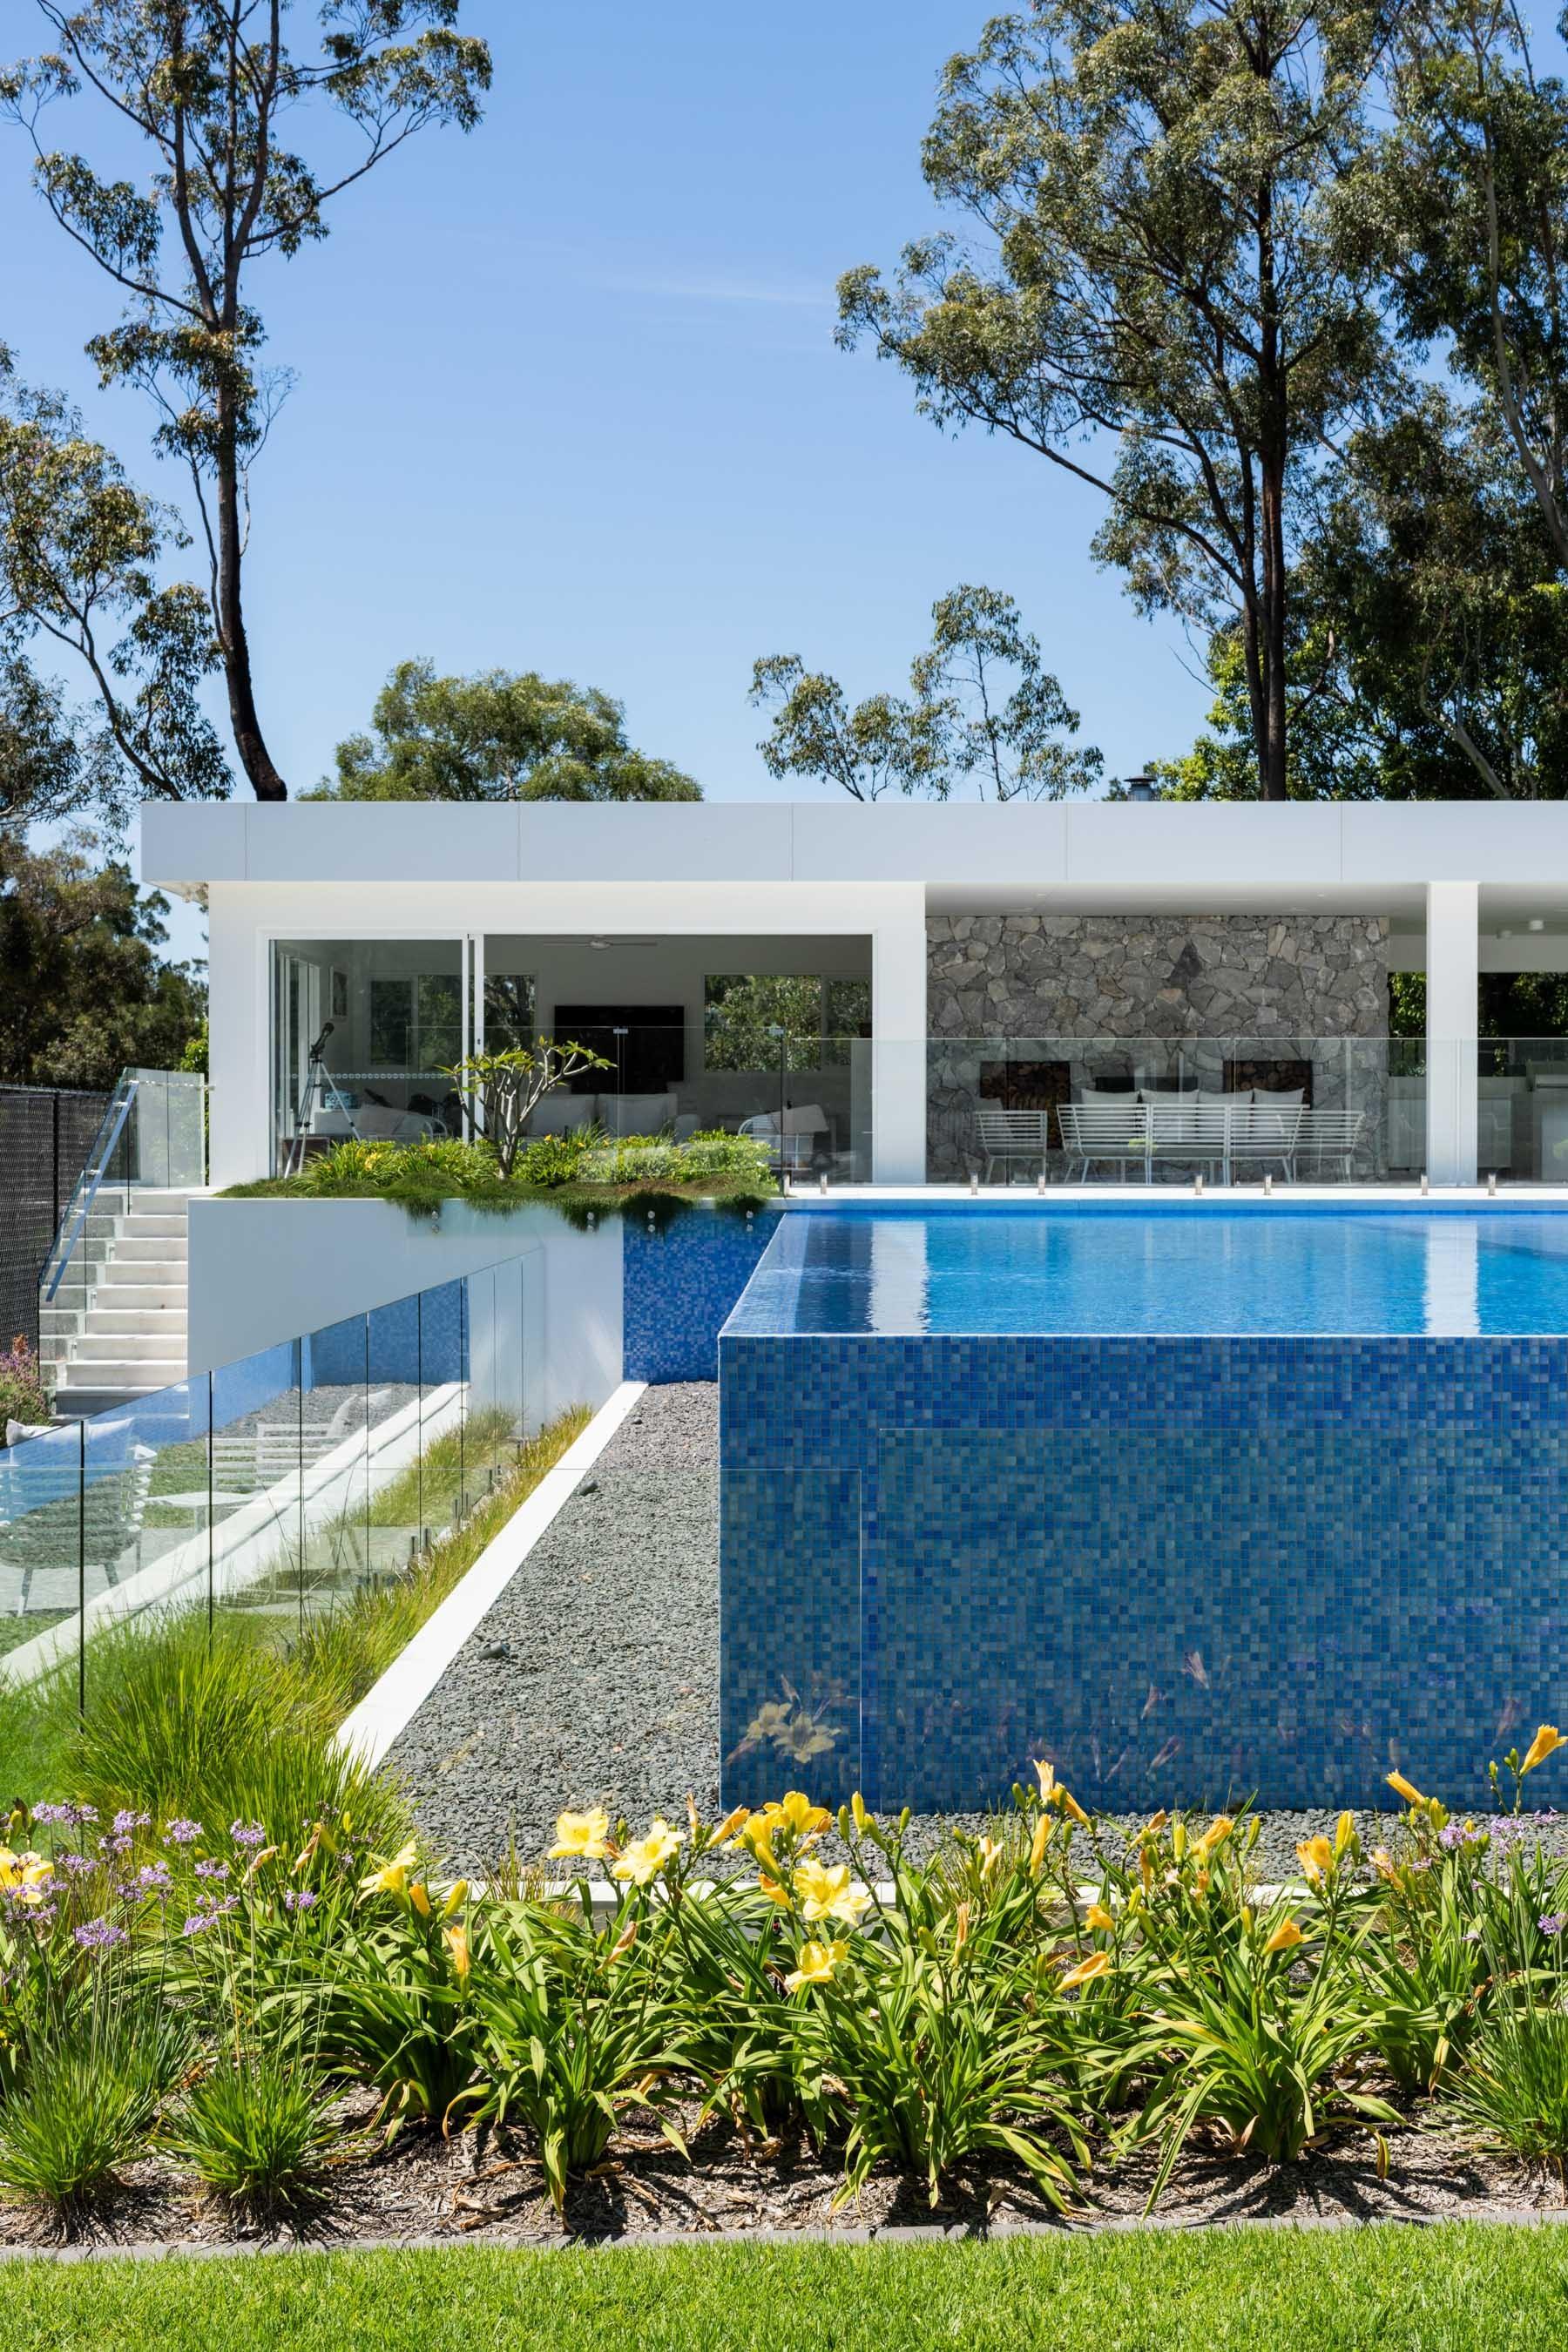 Pool-Tiles Gallery Australian orpheus-01